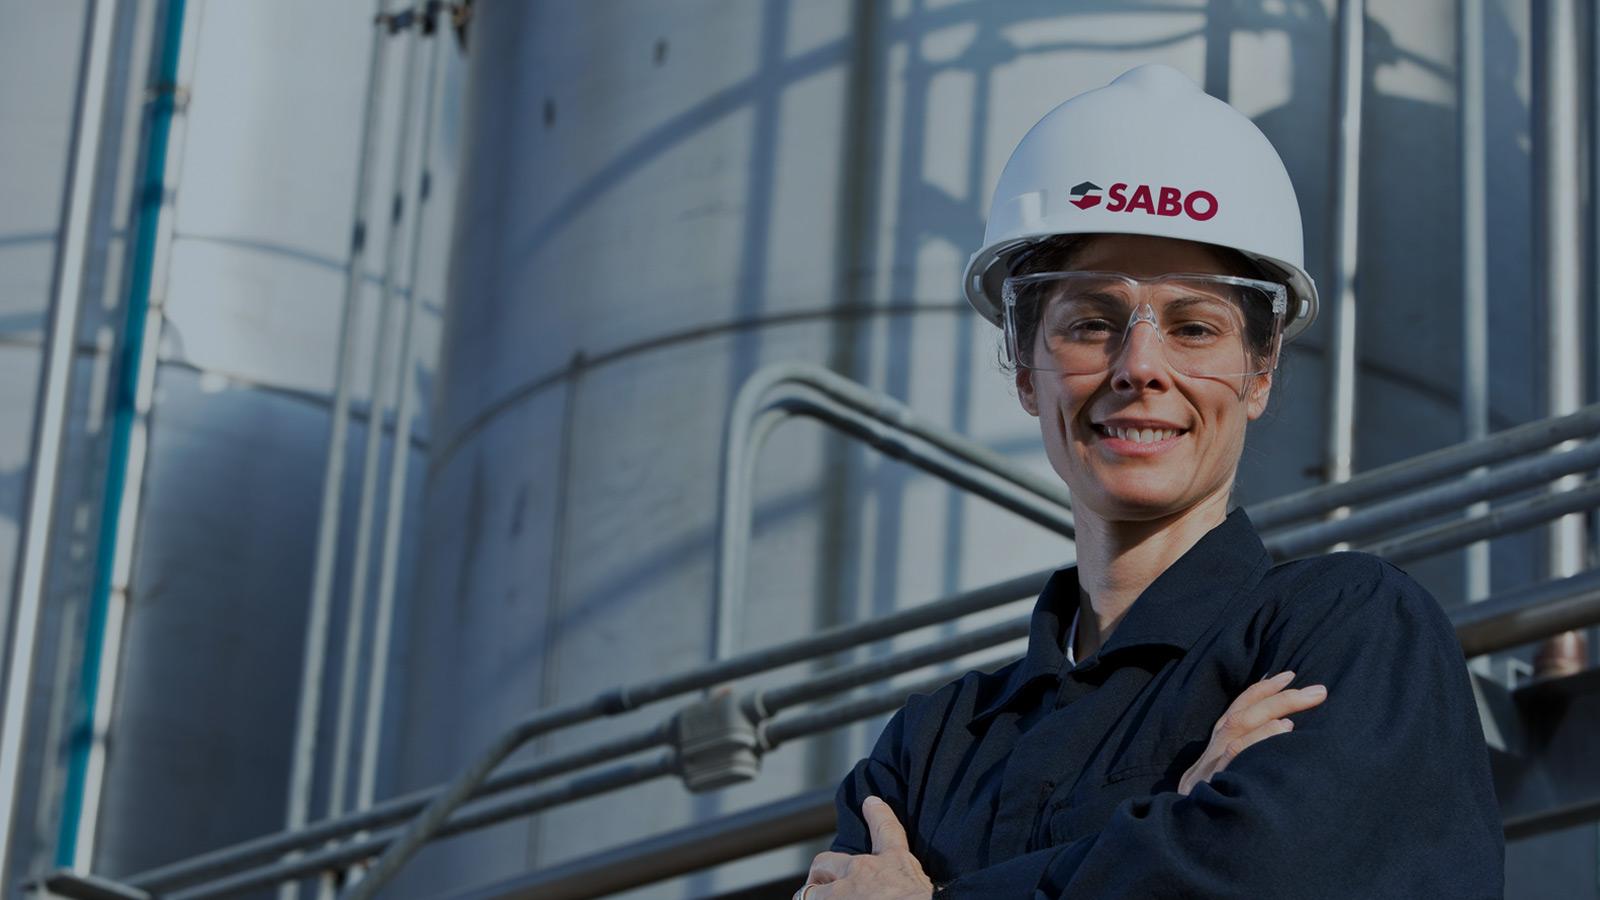 Sabo Safety